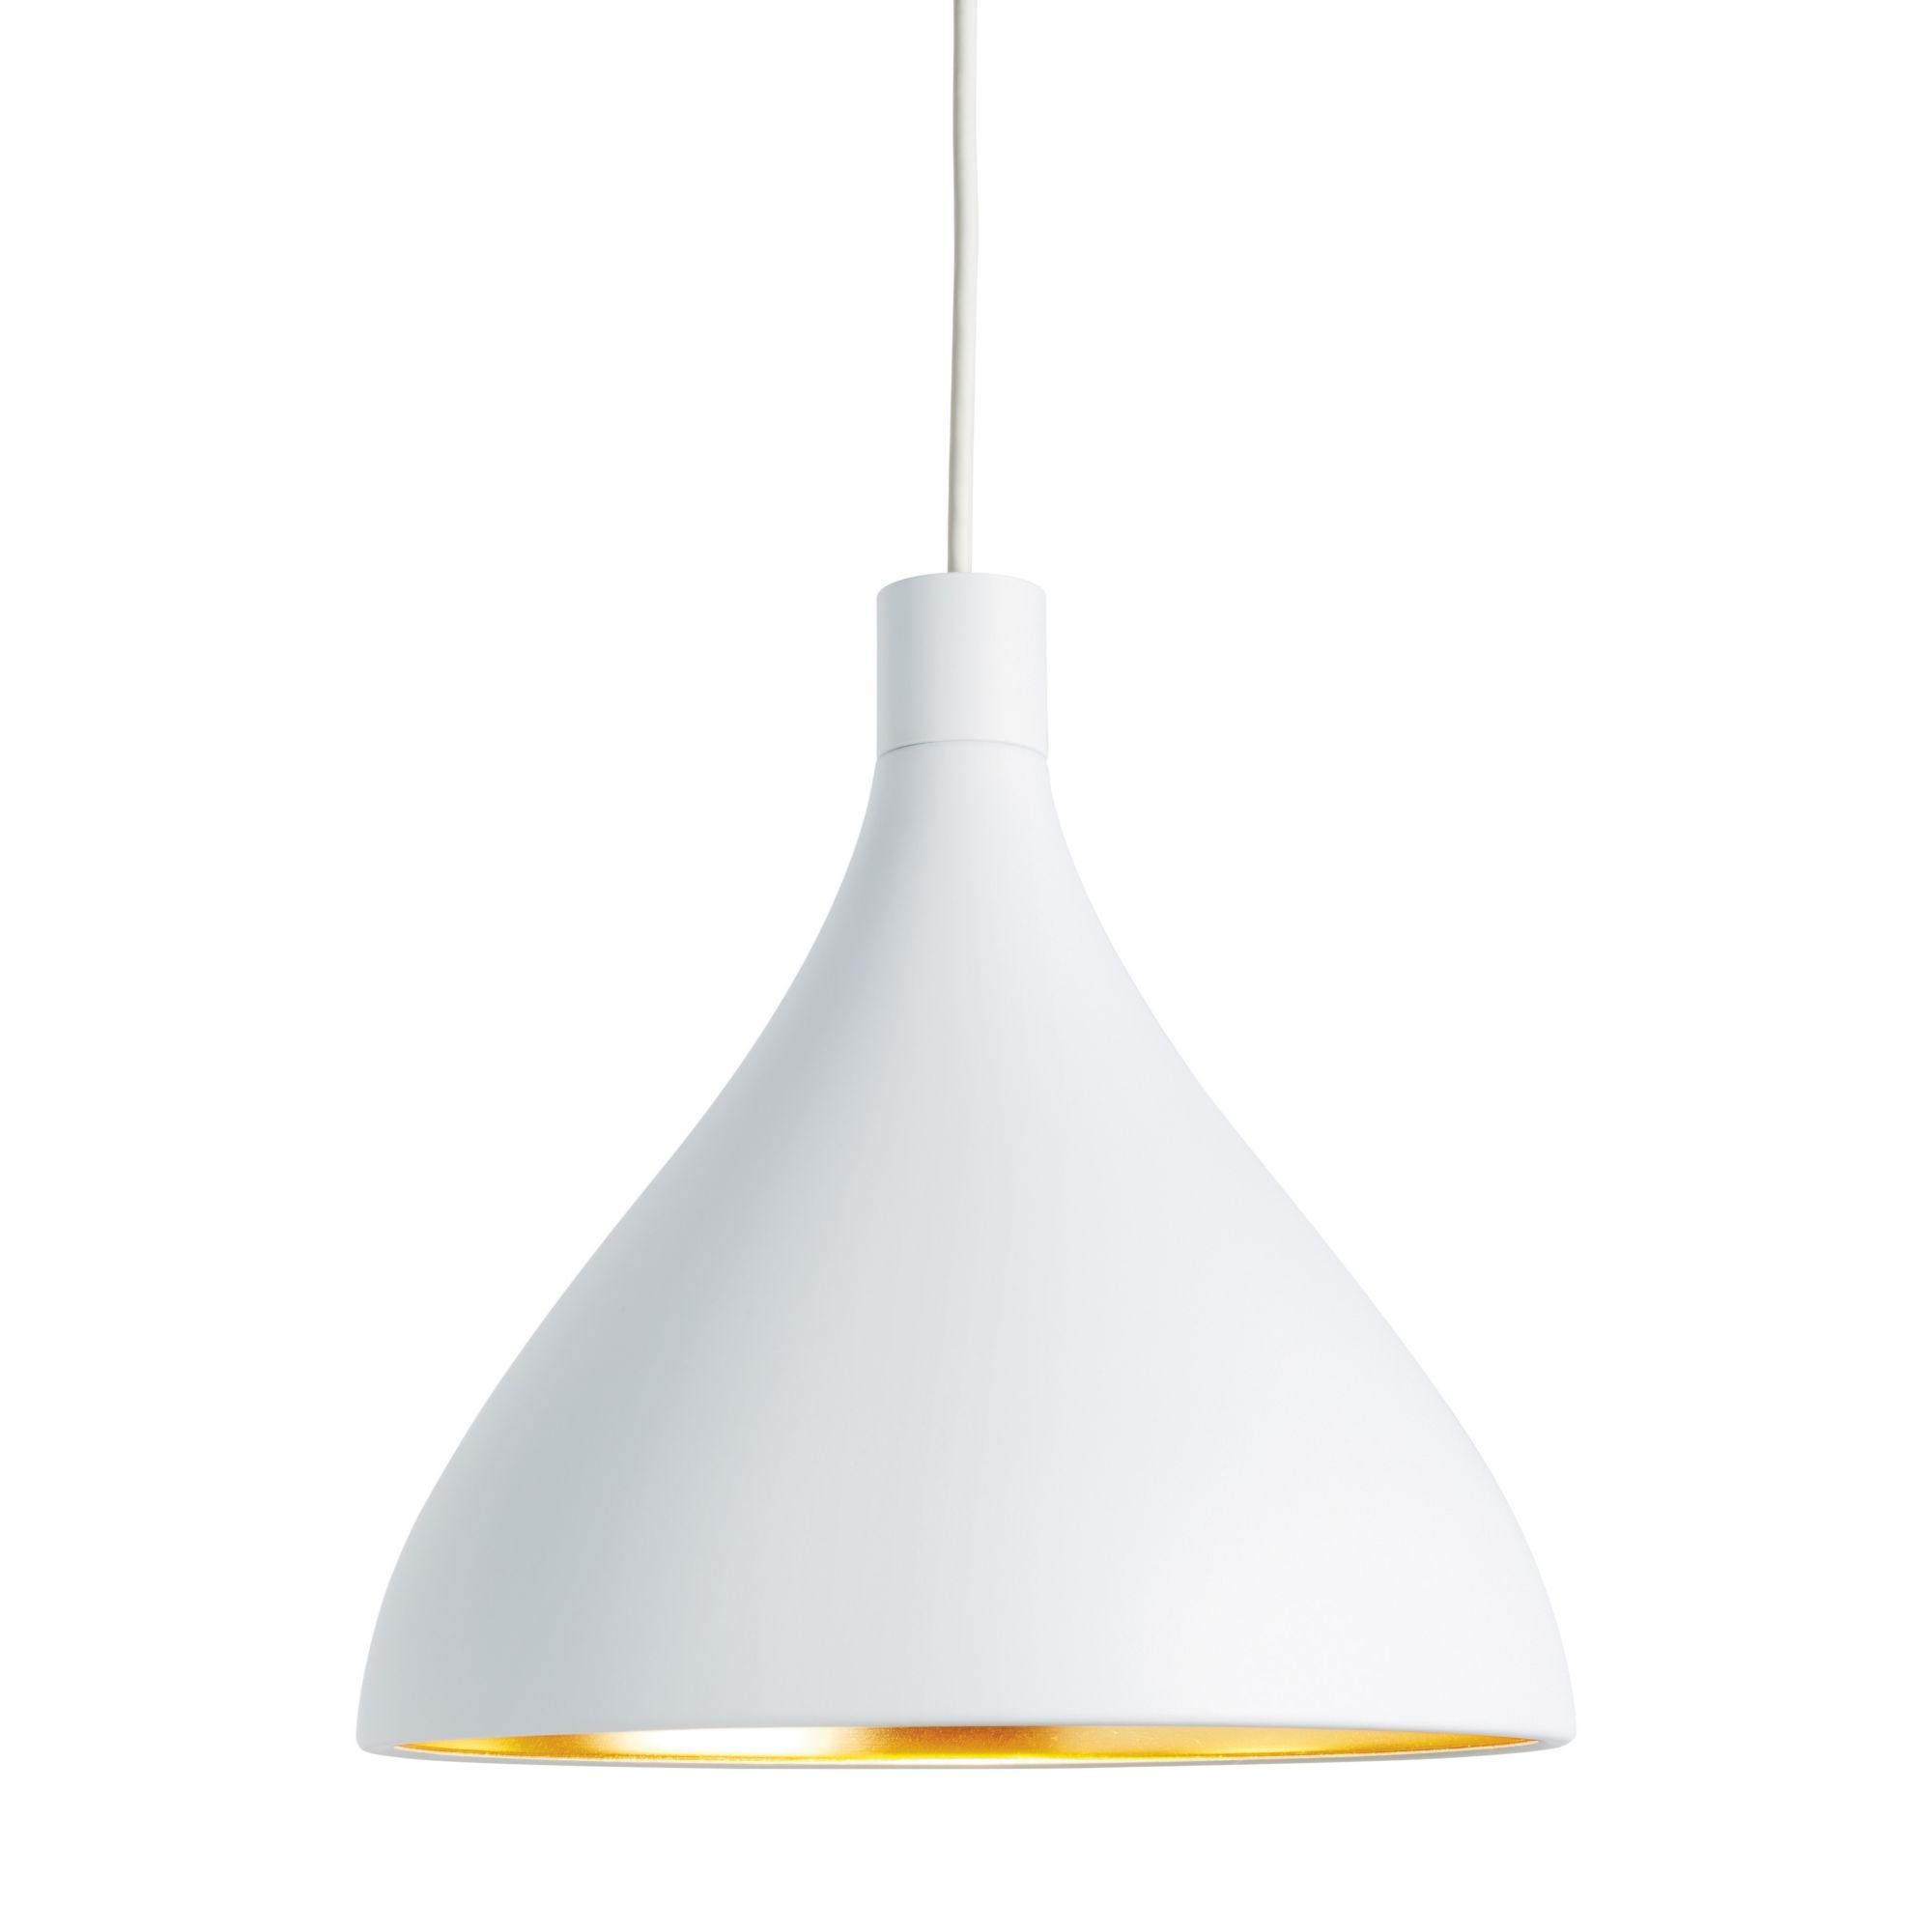 Swell medium led pendant led technology modern light fixtures jackson hole ceiling lights